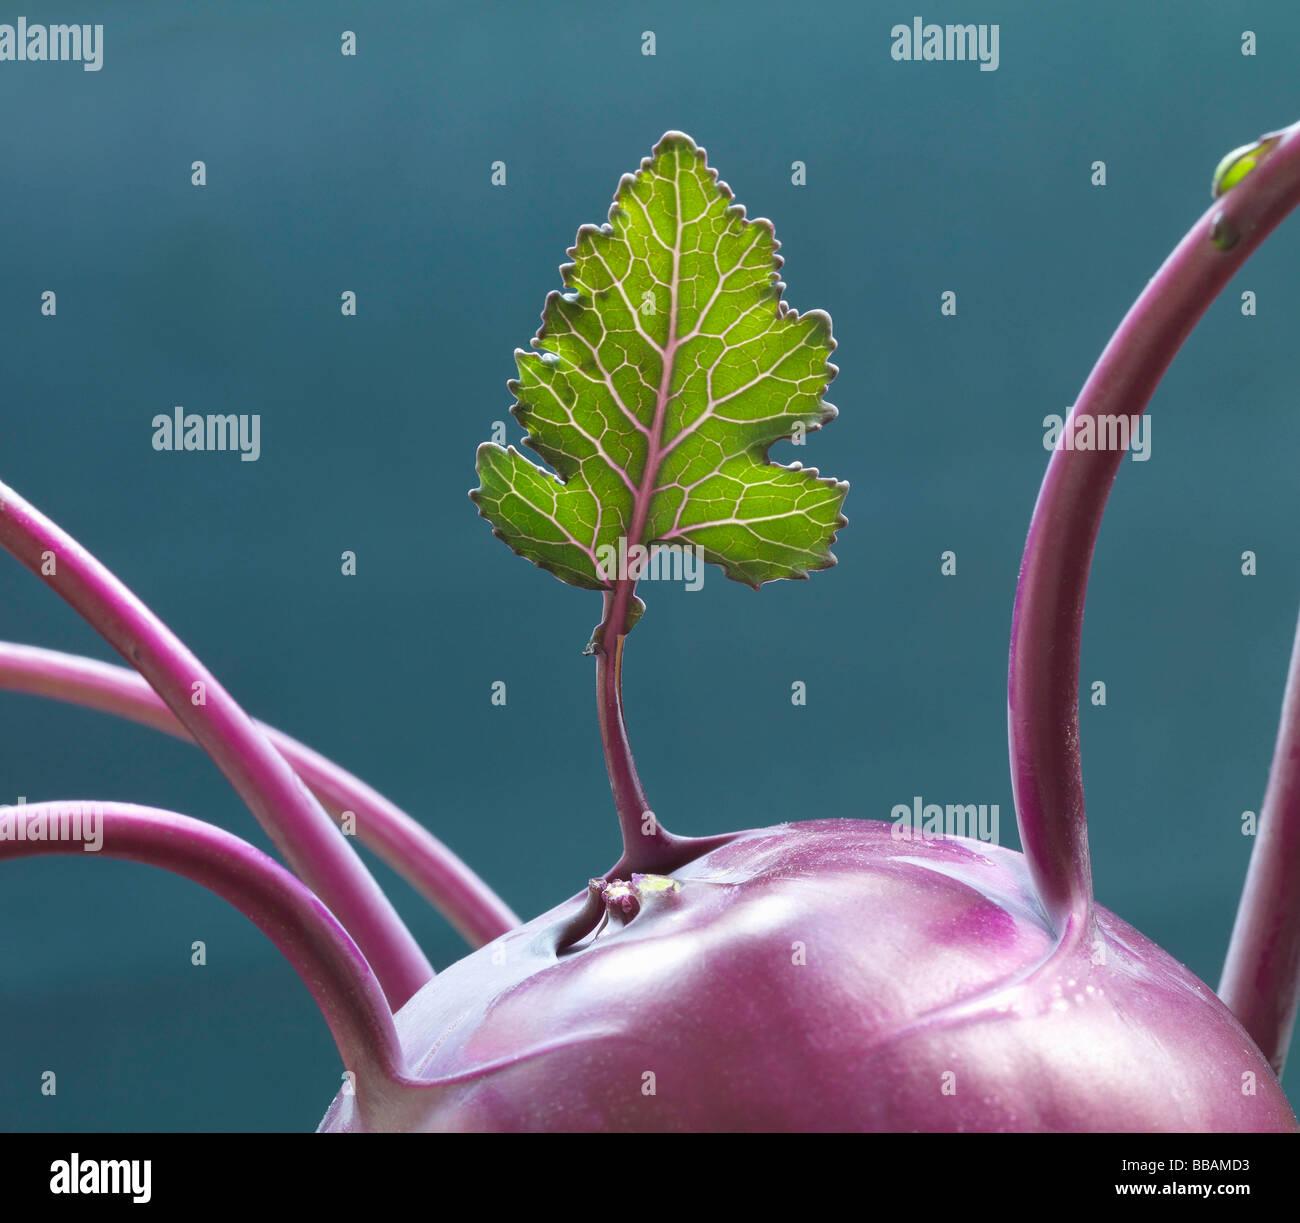 Hoja púrpura que crecen fuera de colinabo Imagen De Stock